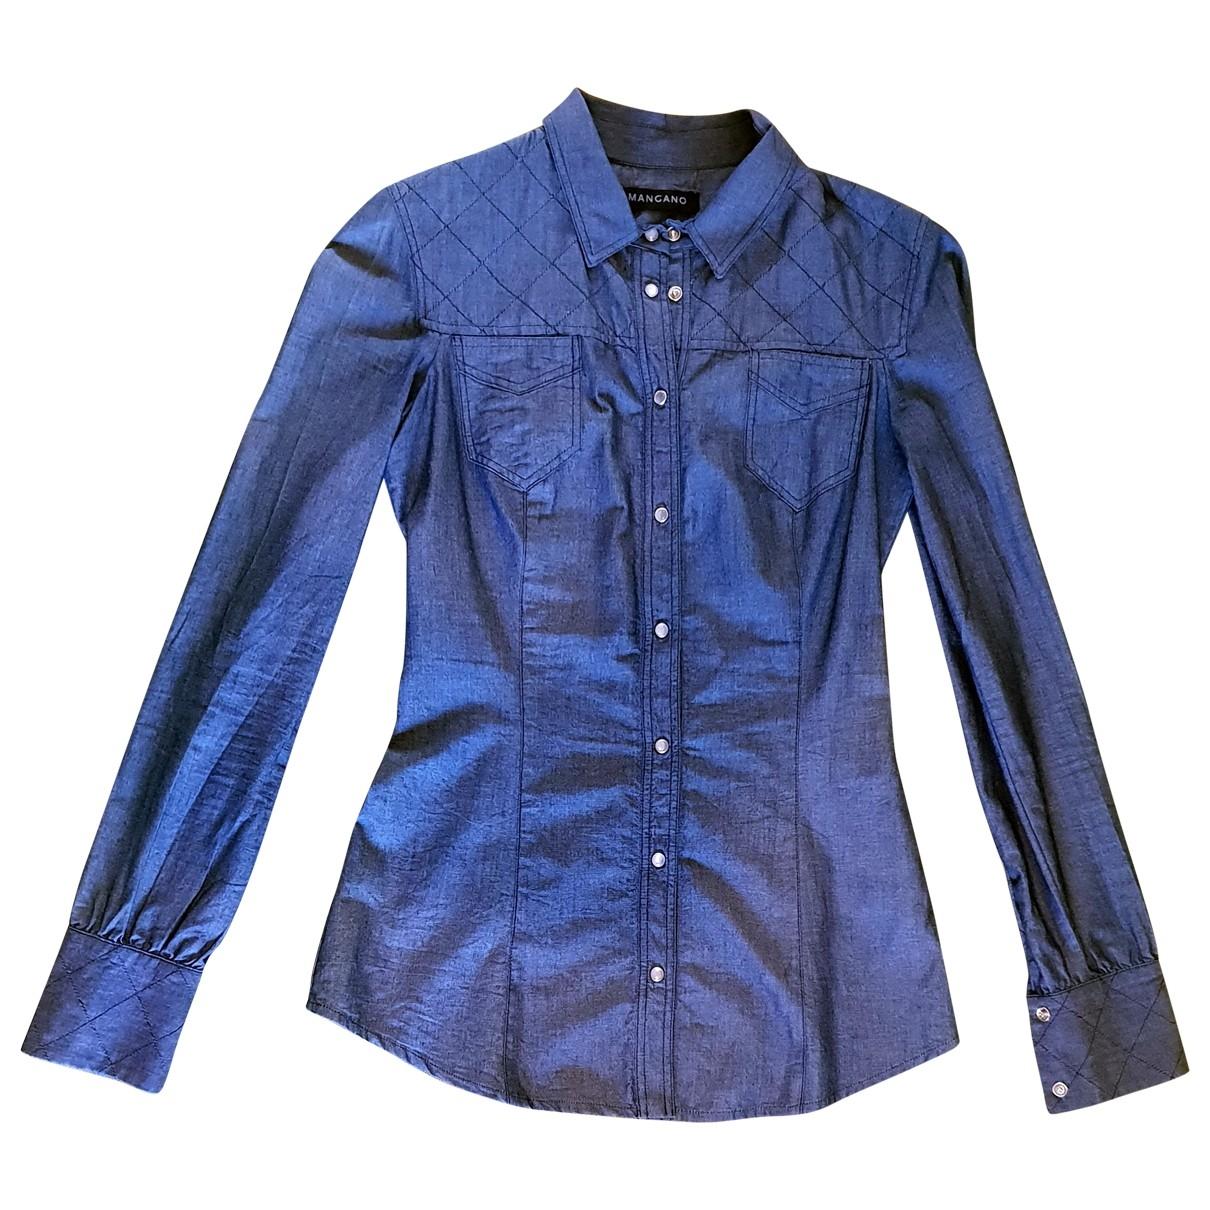 Mangano \N Top in  Blau Denim - Jeans